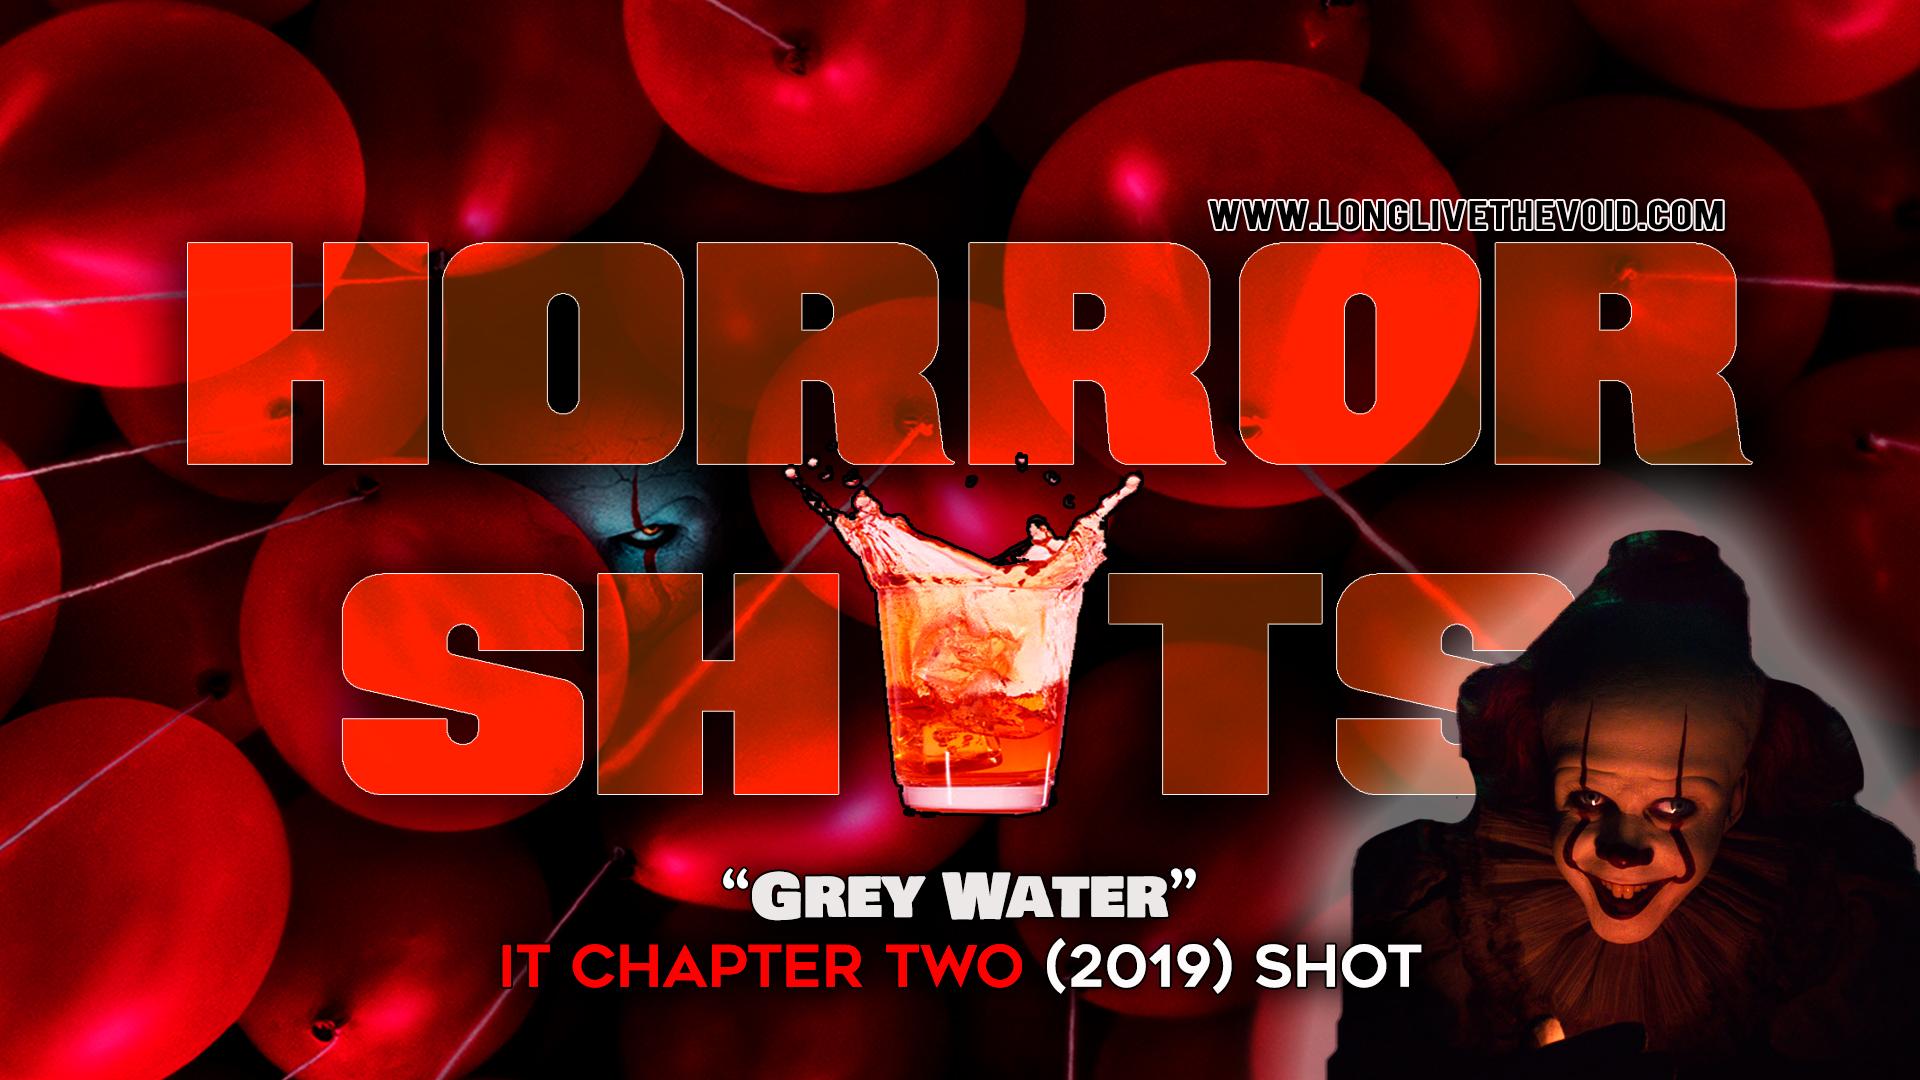 Grey-Water-IT-Chapter-Two-(2019)-Shot.jpg